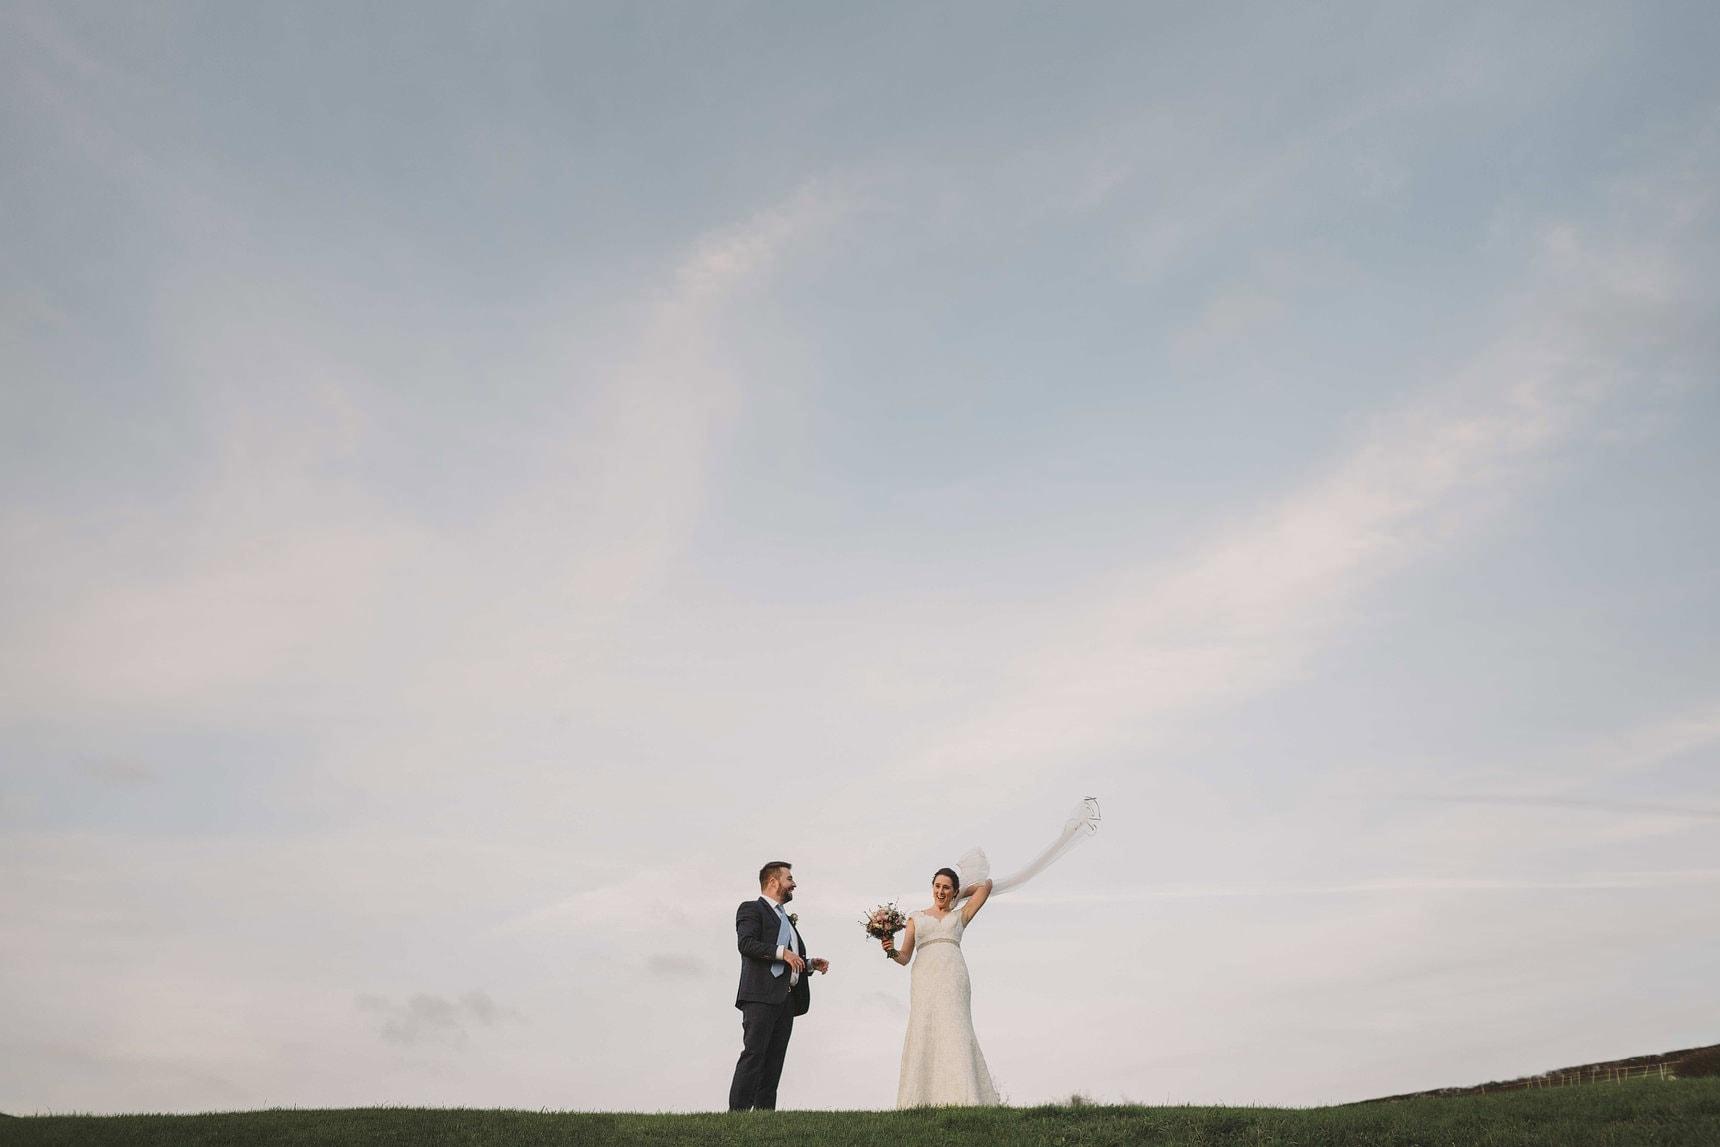 brighton wedding photographer portraits